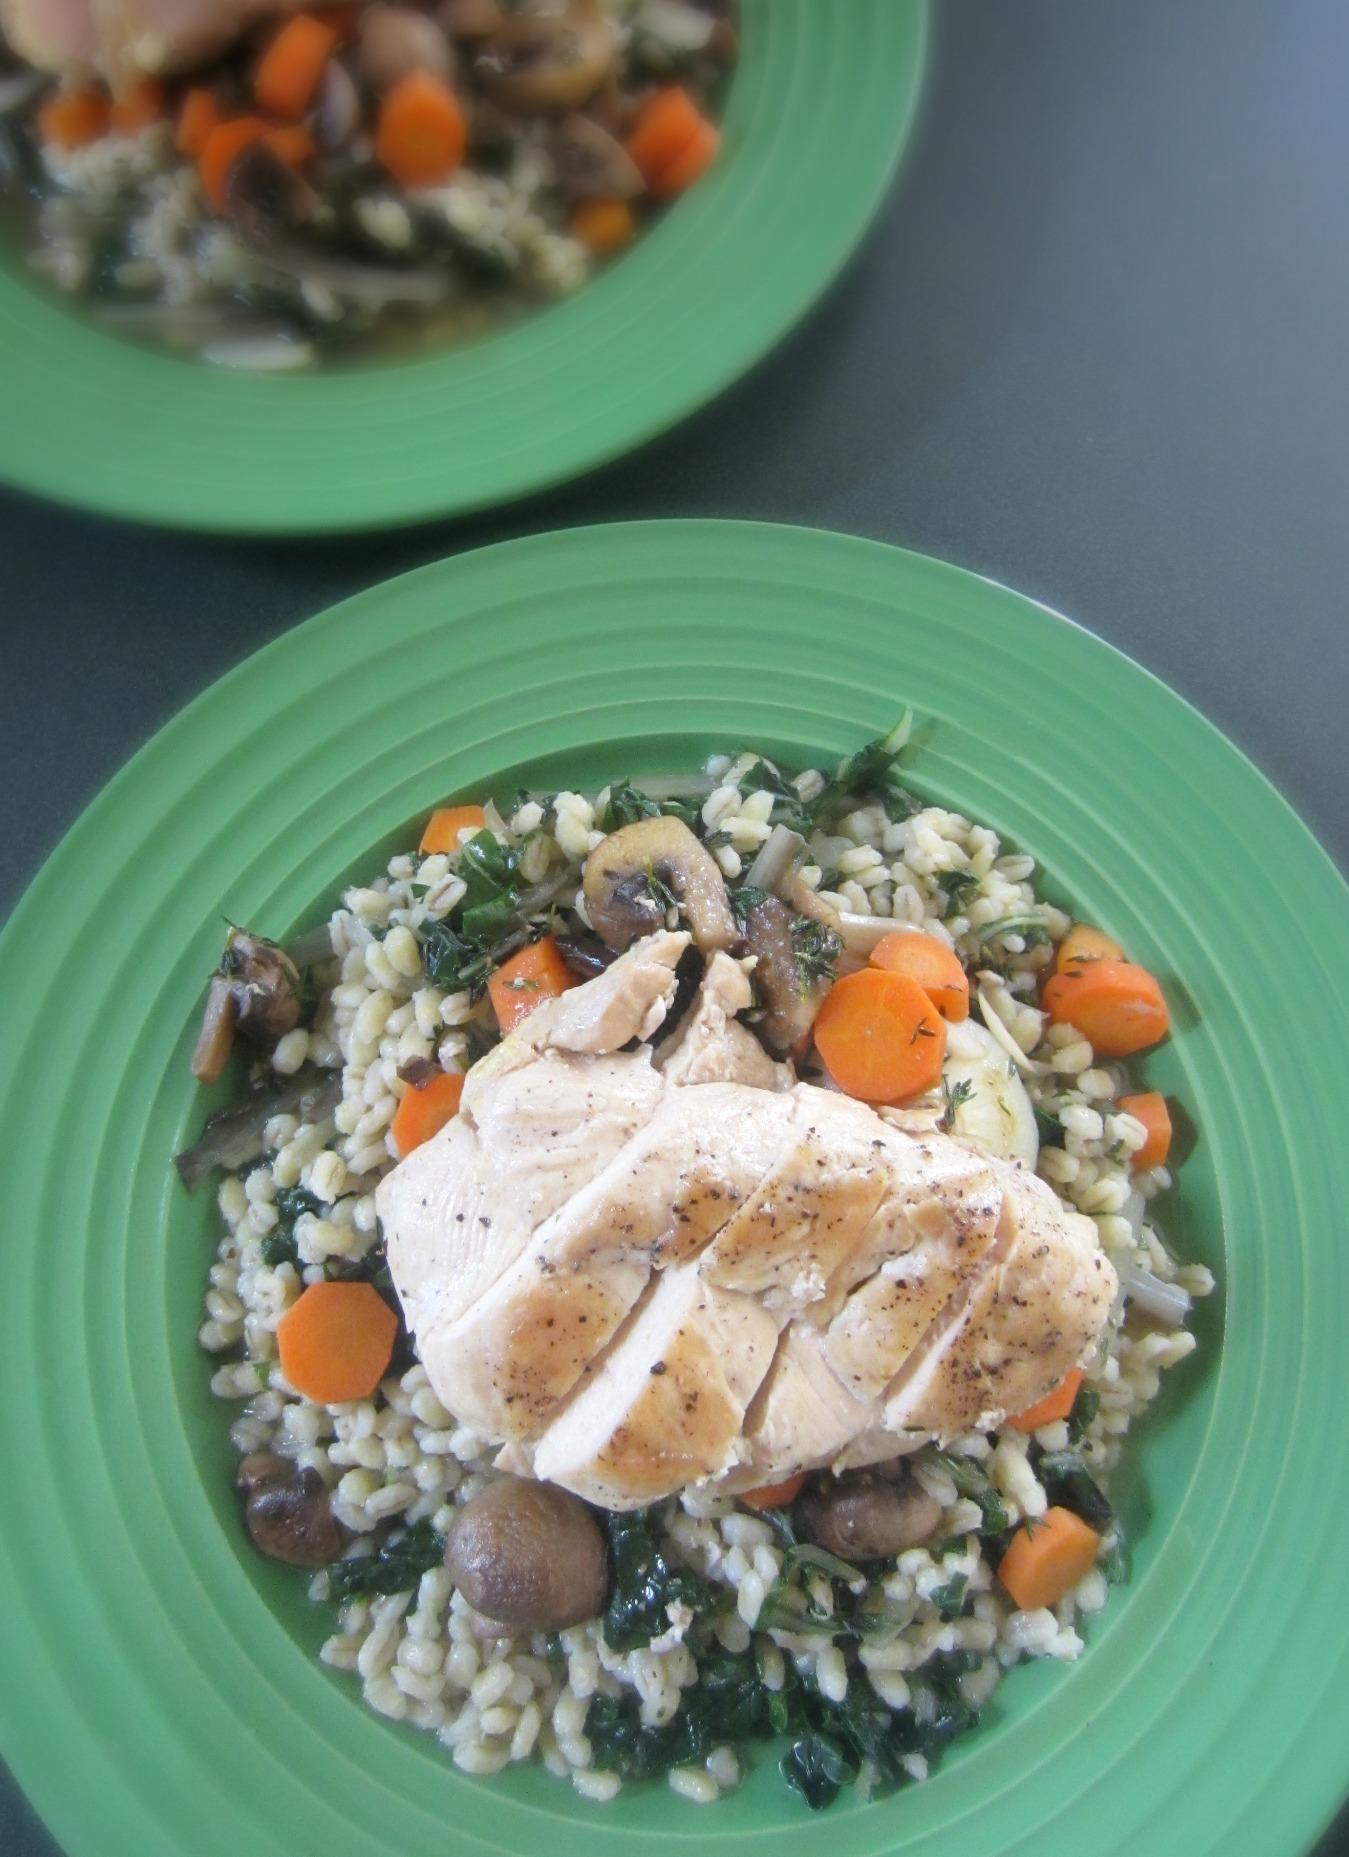 Pan-Seared Chicken Verjus Blue Apron Meal 2